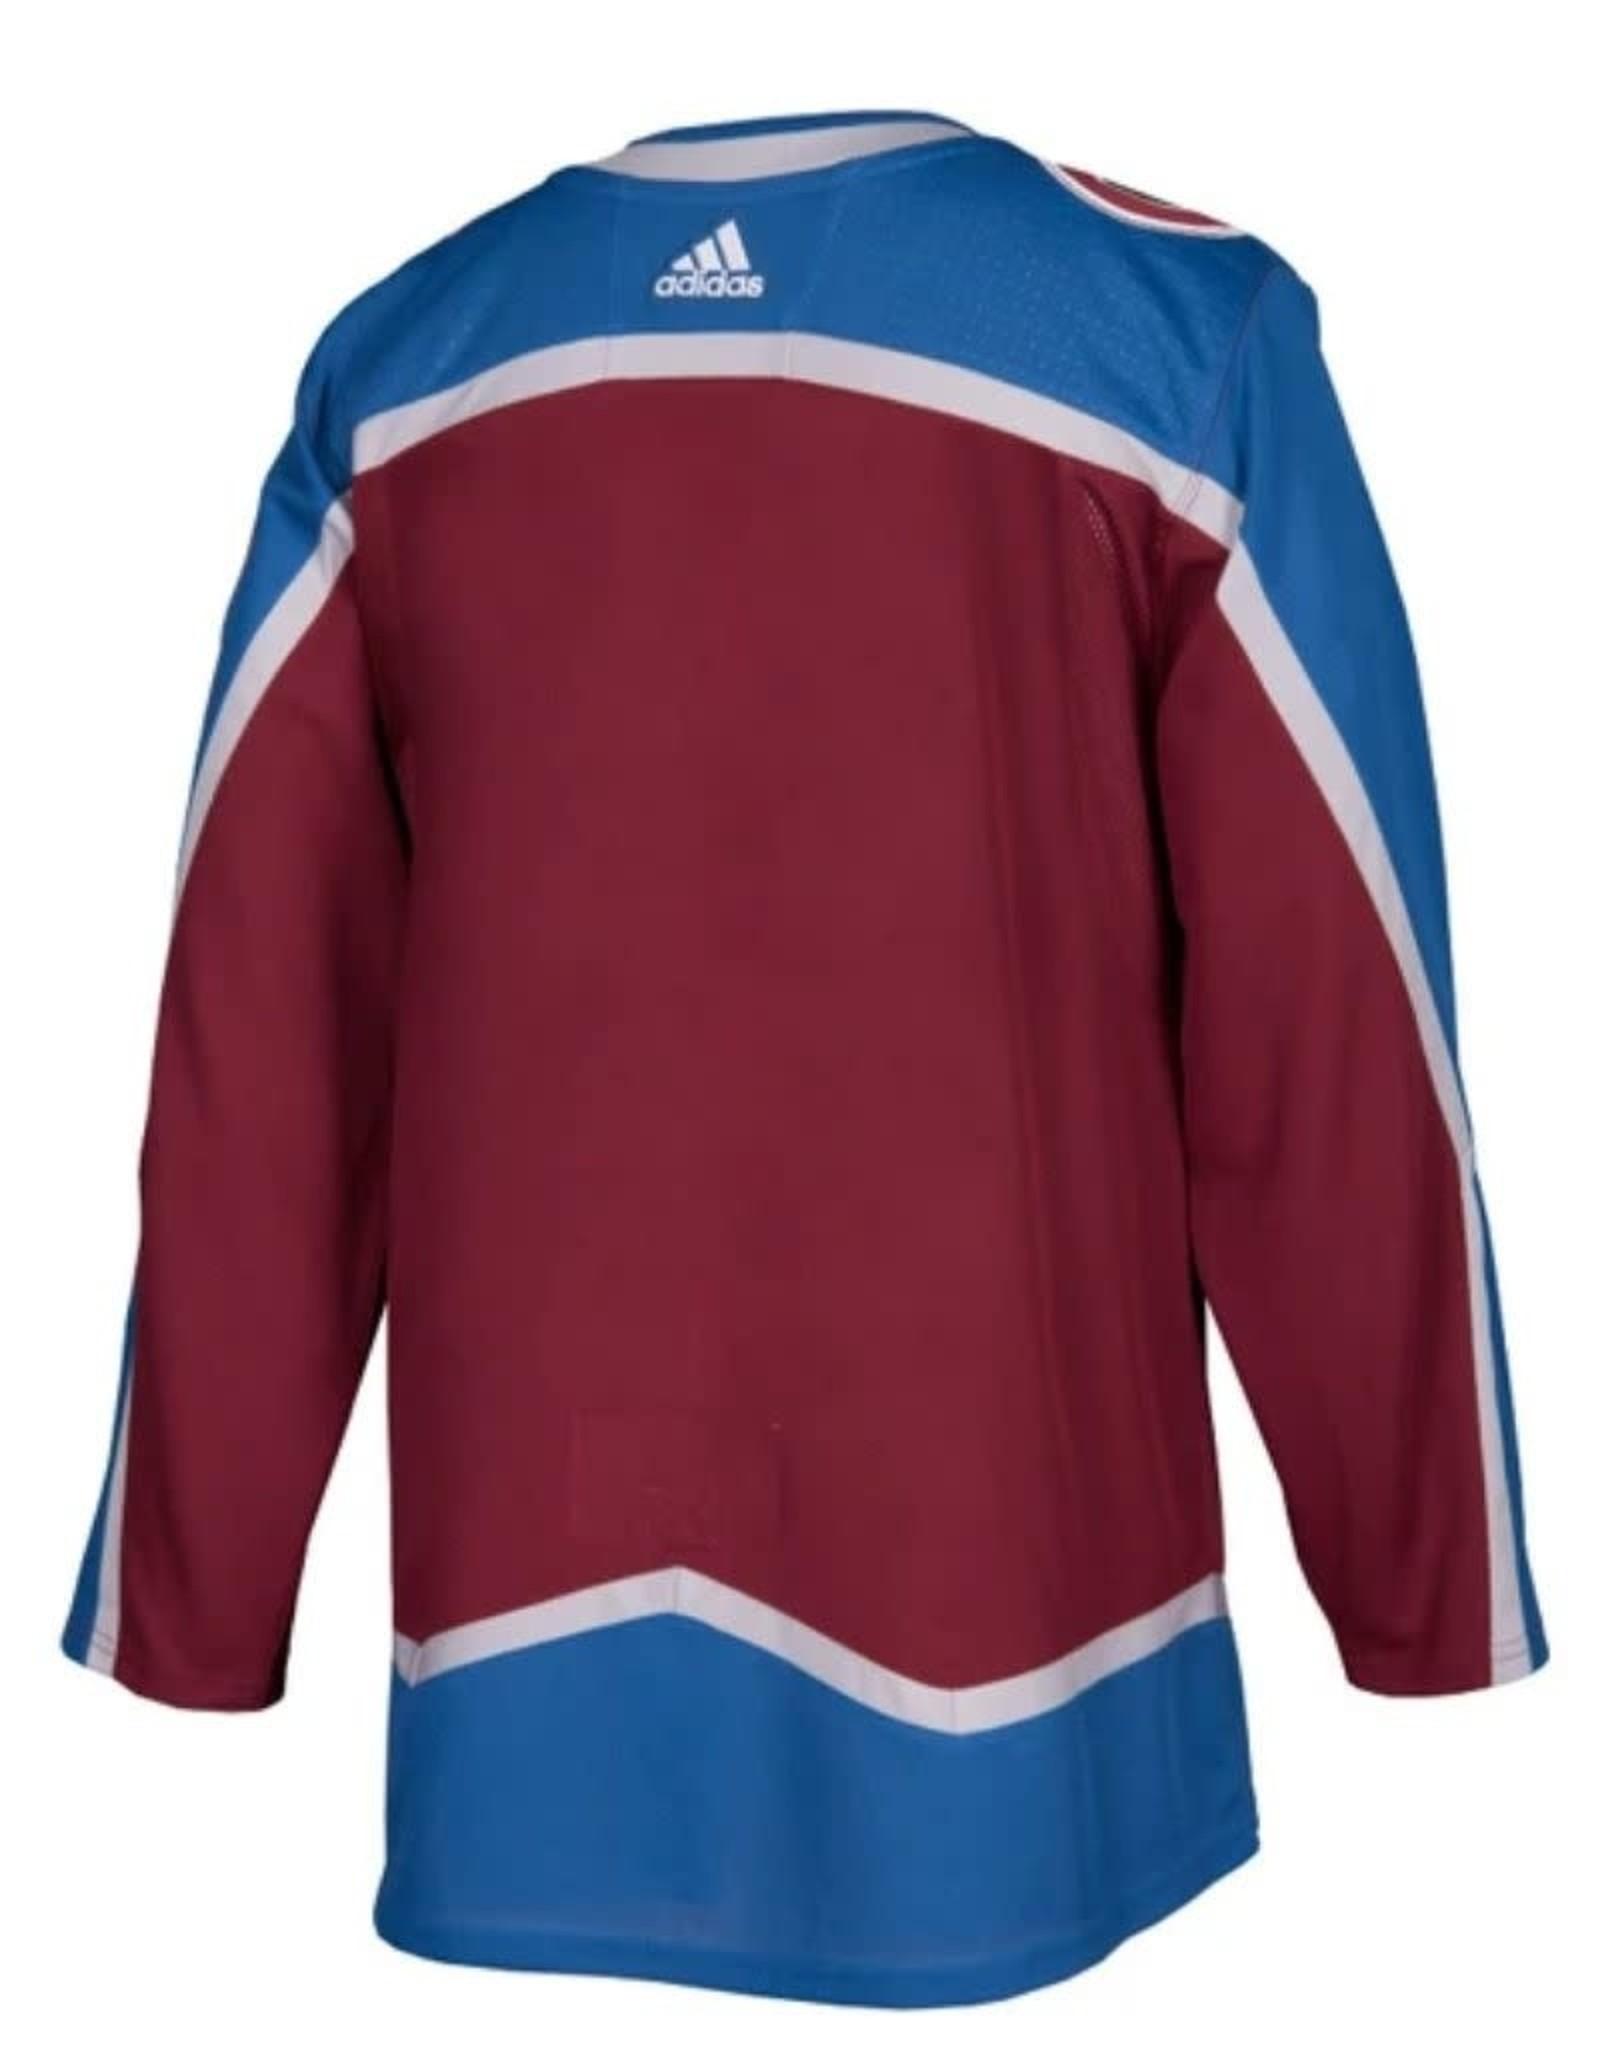 Adidas  Adidas Adult Authentic Colorado Avalanche Jersey Burgundy